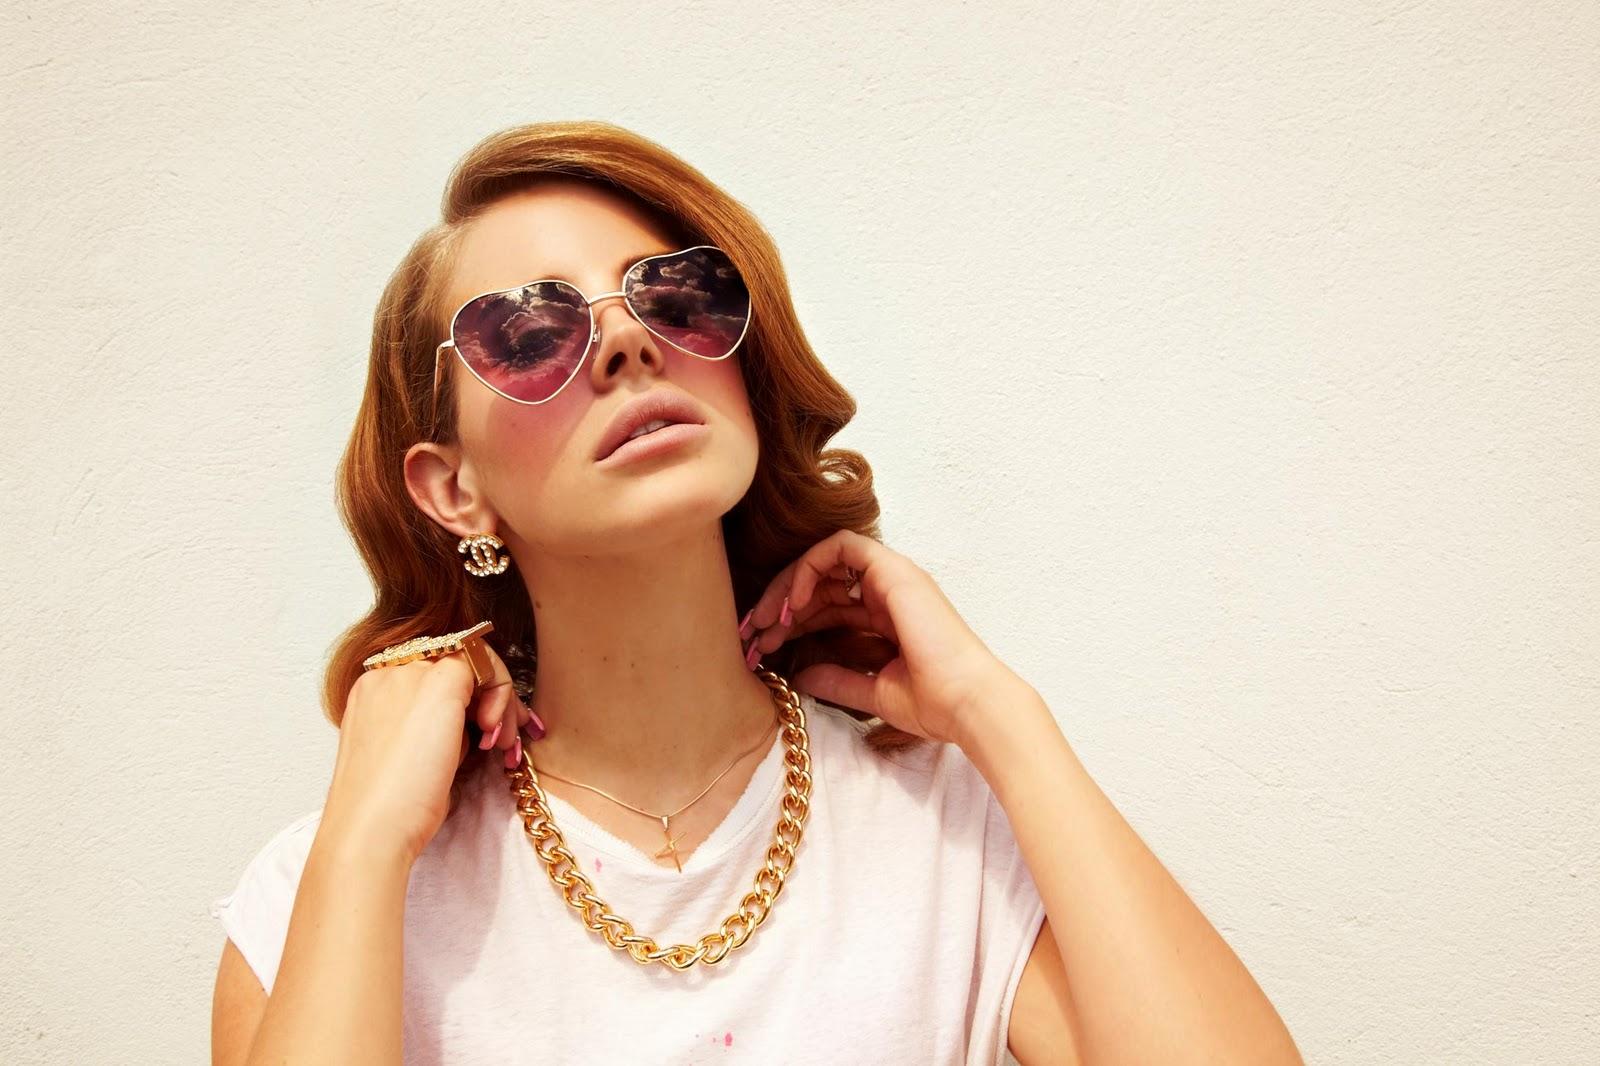 Певица Lana Del Rey На качелях бесплатно